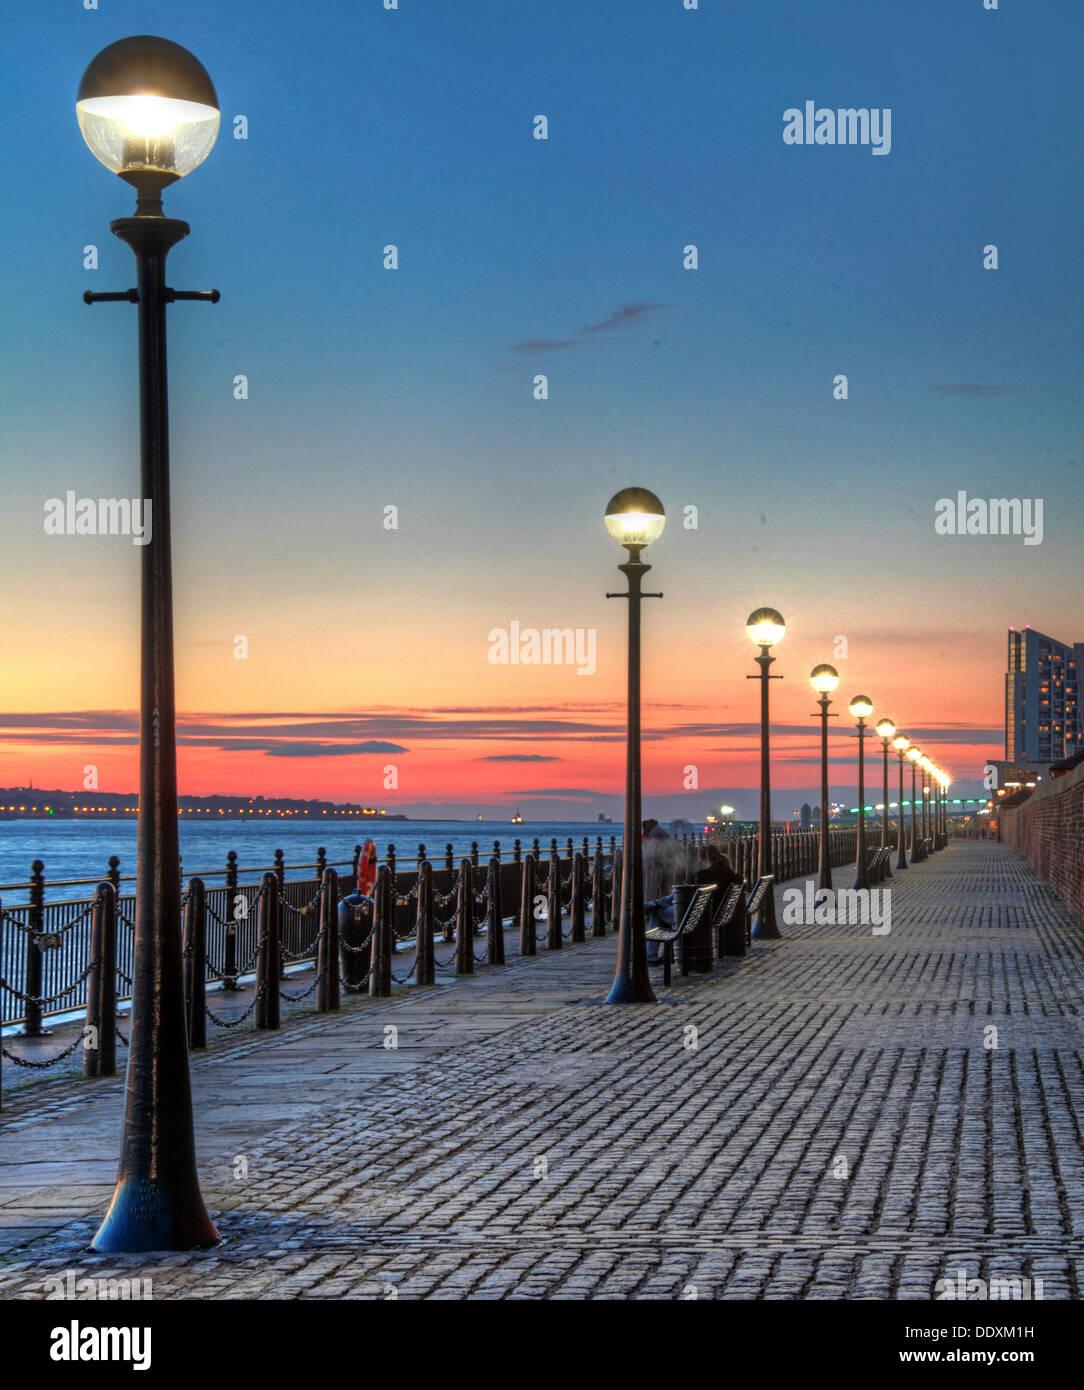 Albert Dock at Nighttime liverpool Merseyside England UK Stock Photo